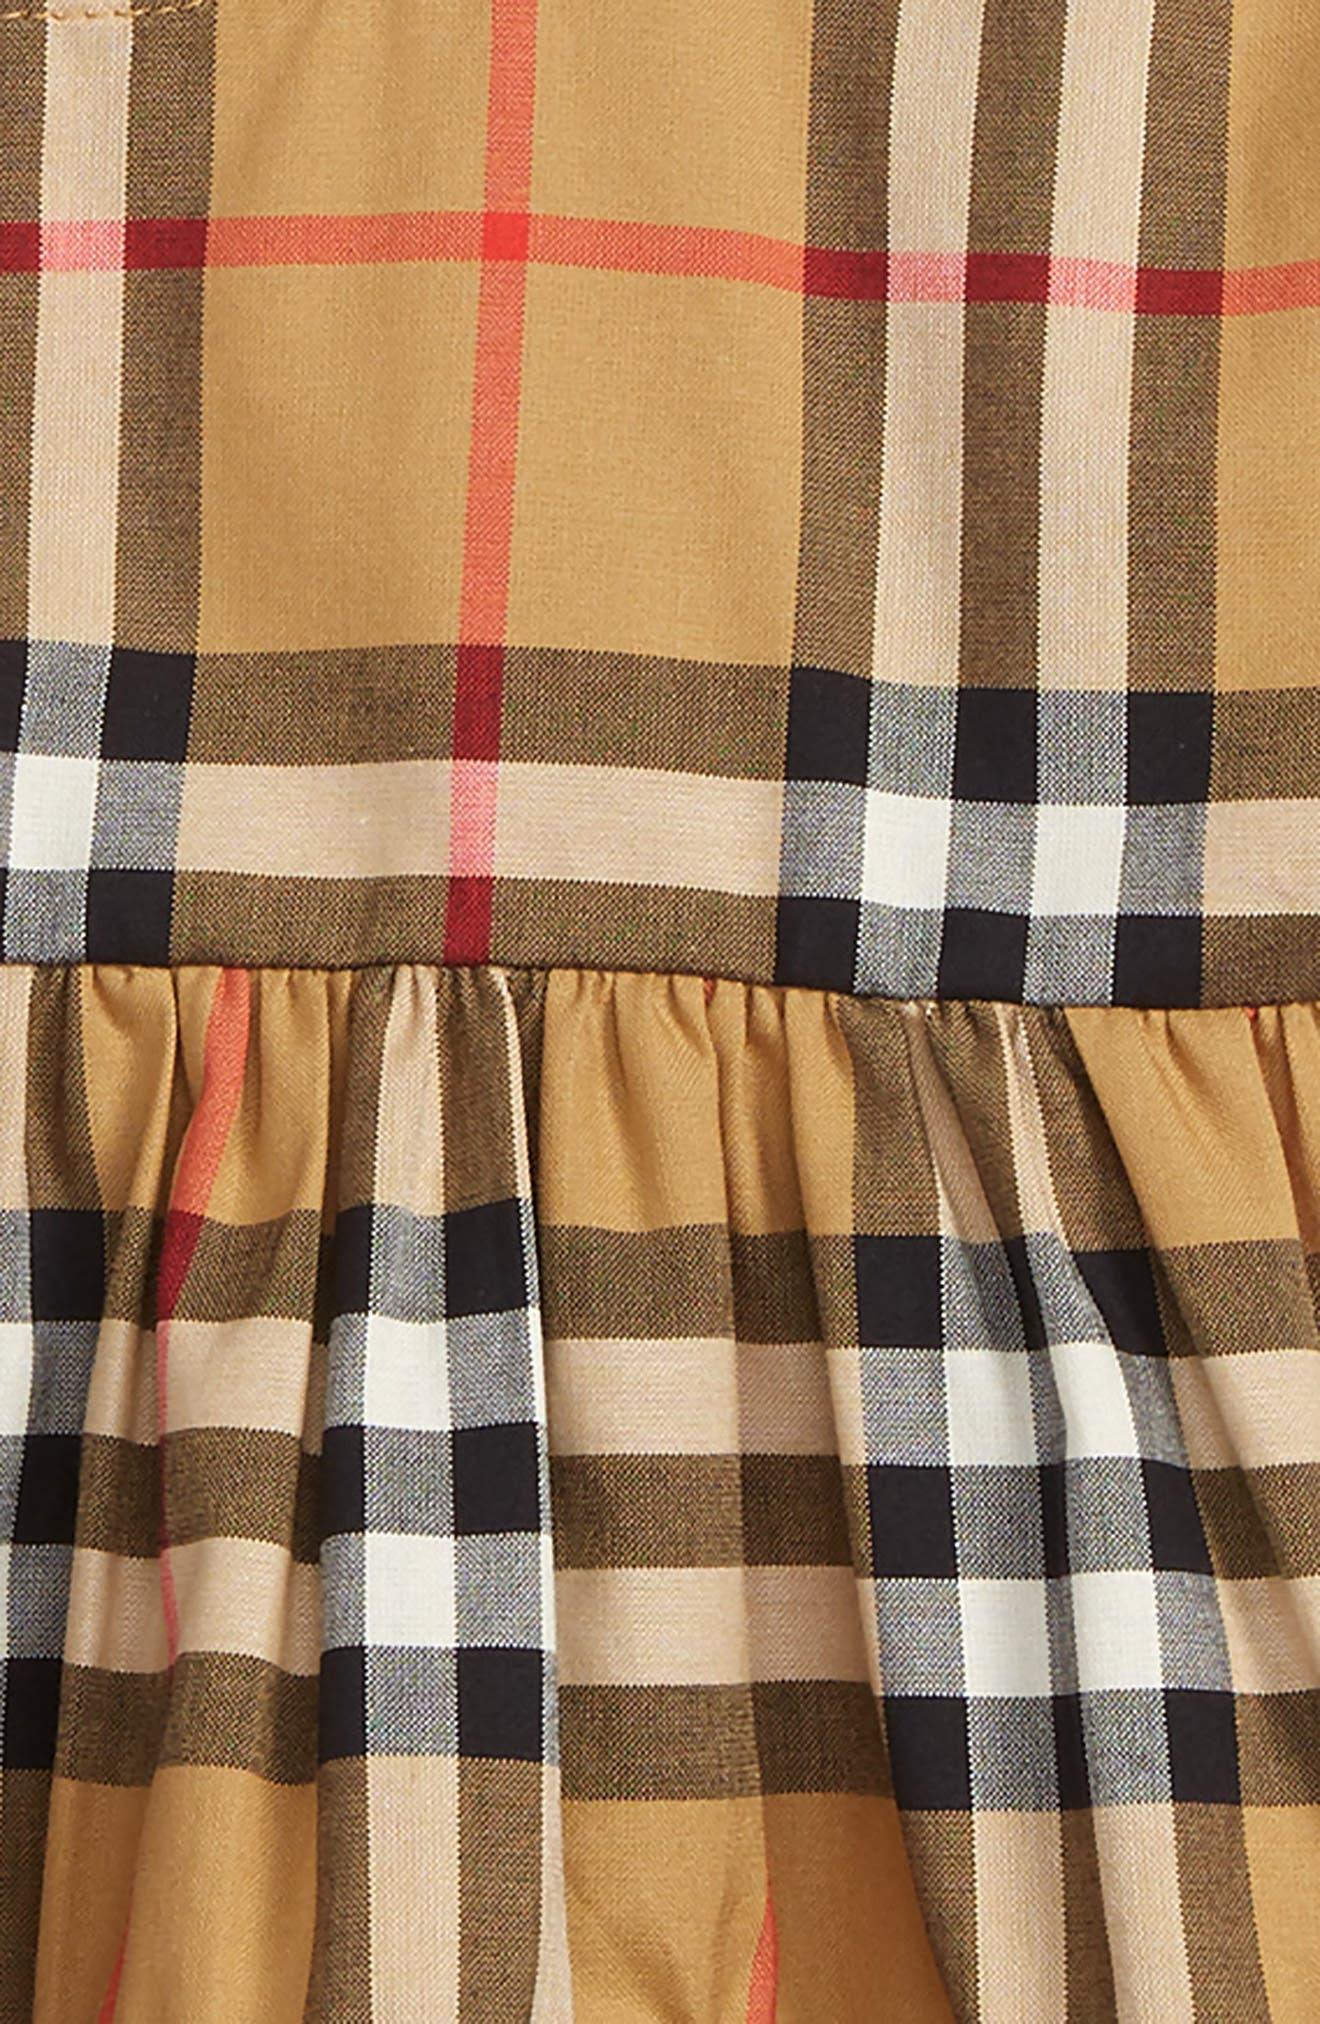 BURBERRY, Alima Check Dress, Alternate thumbnail 2, color, ANTIQUE YELLOW